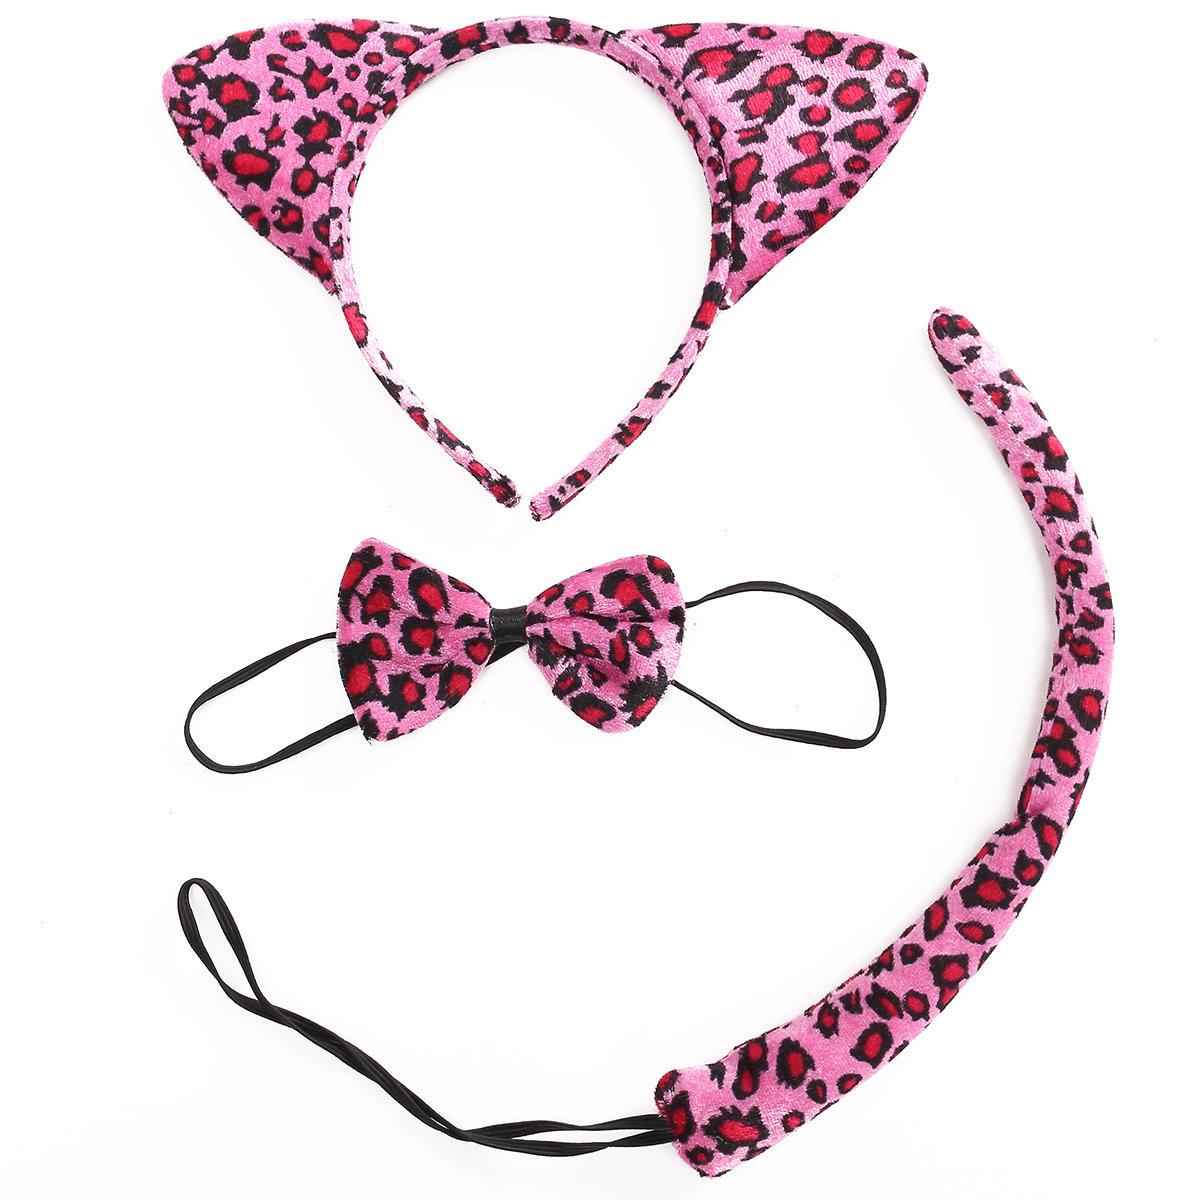 Animal Leopard Ear Set Hairband Bow Tie Tail Headband Party Halloween Wear